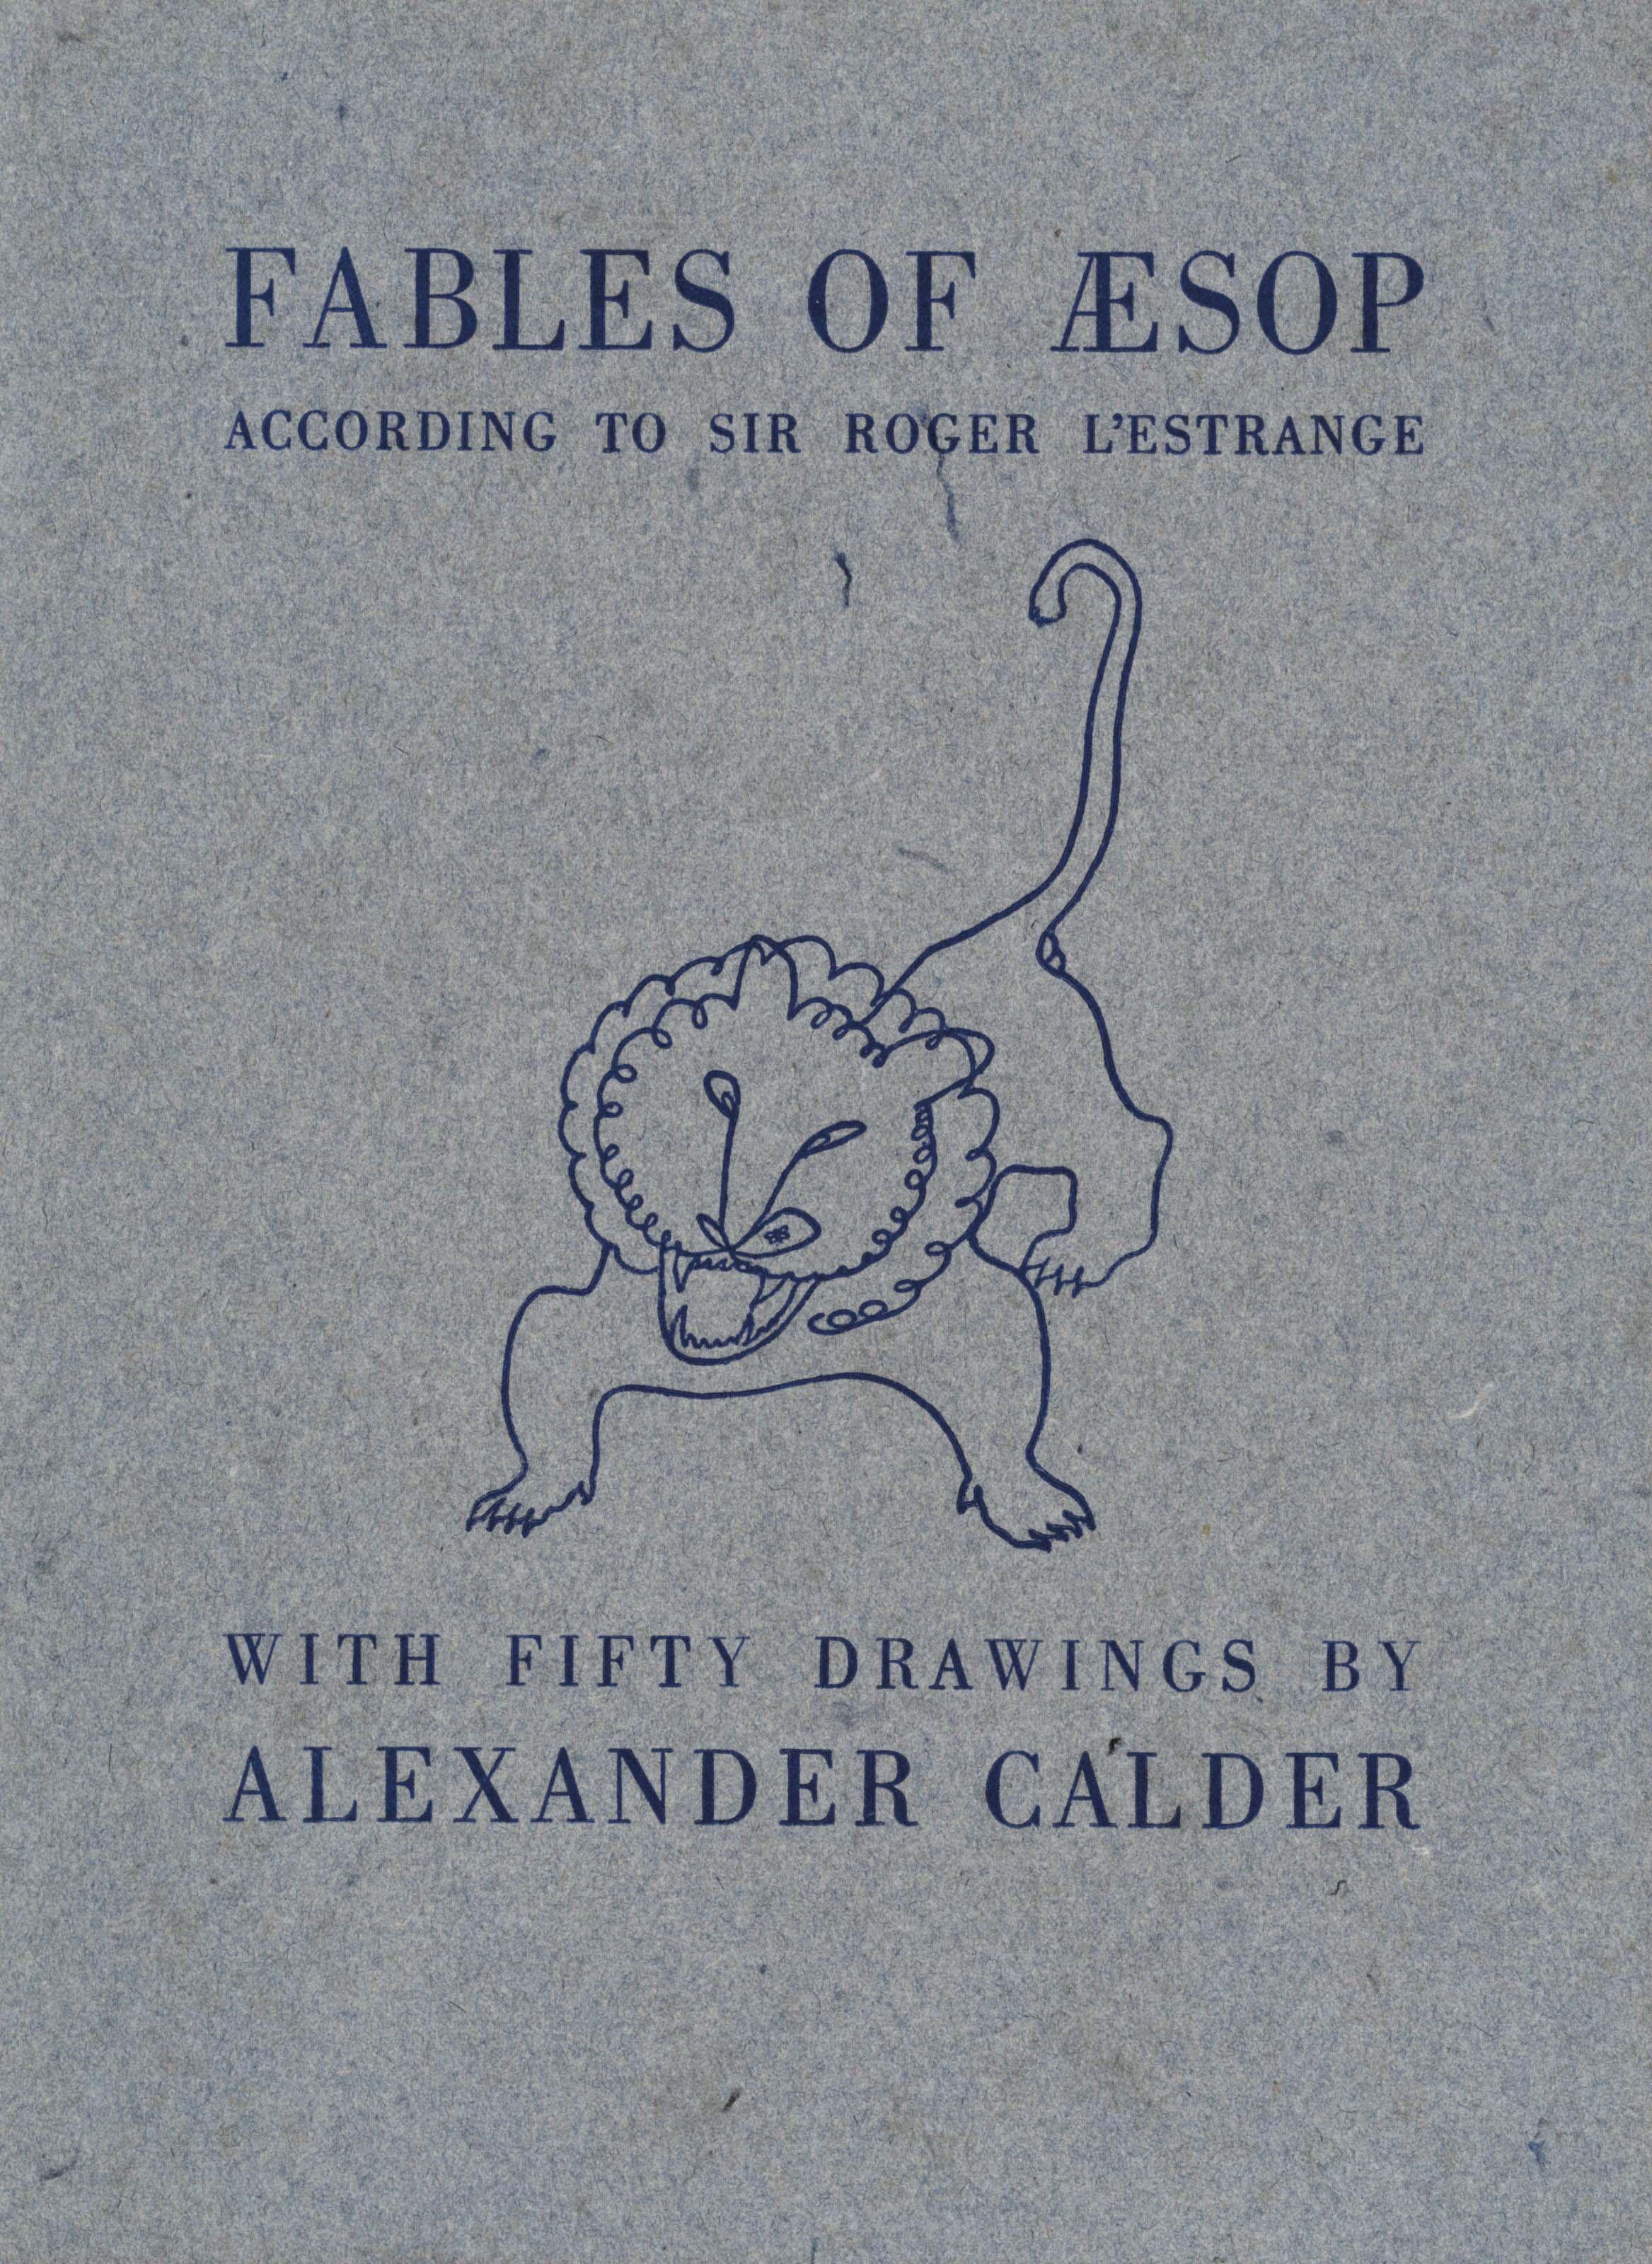 CALDER, Alexander (1898-1976),